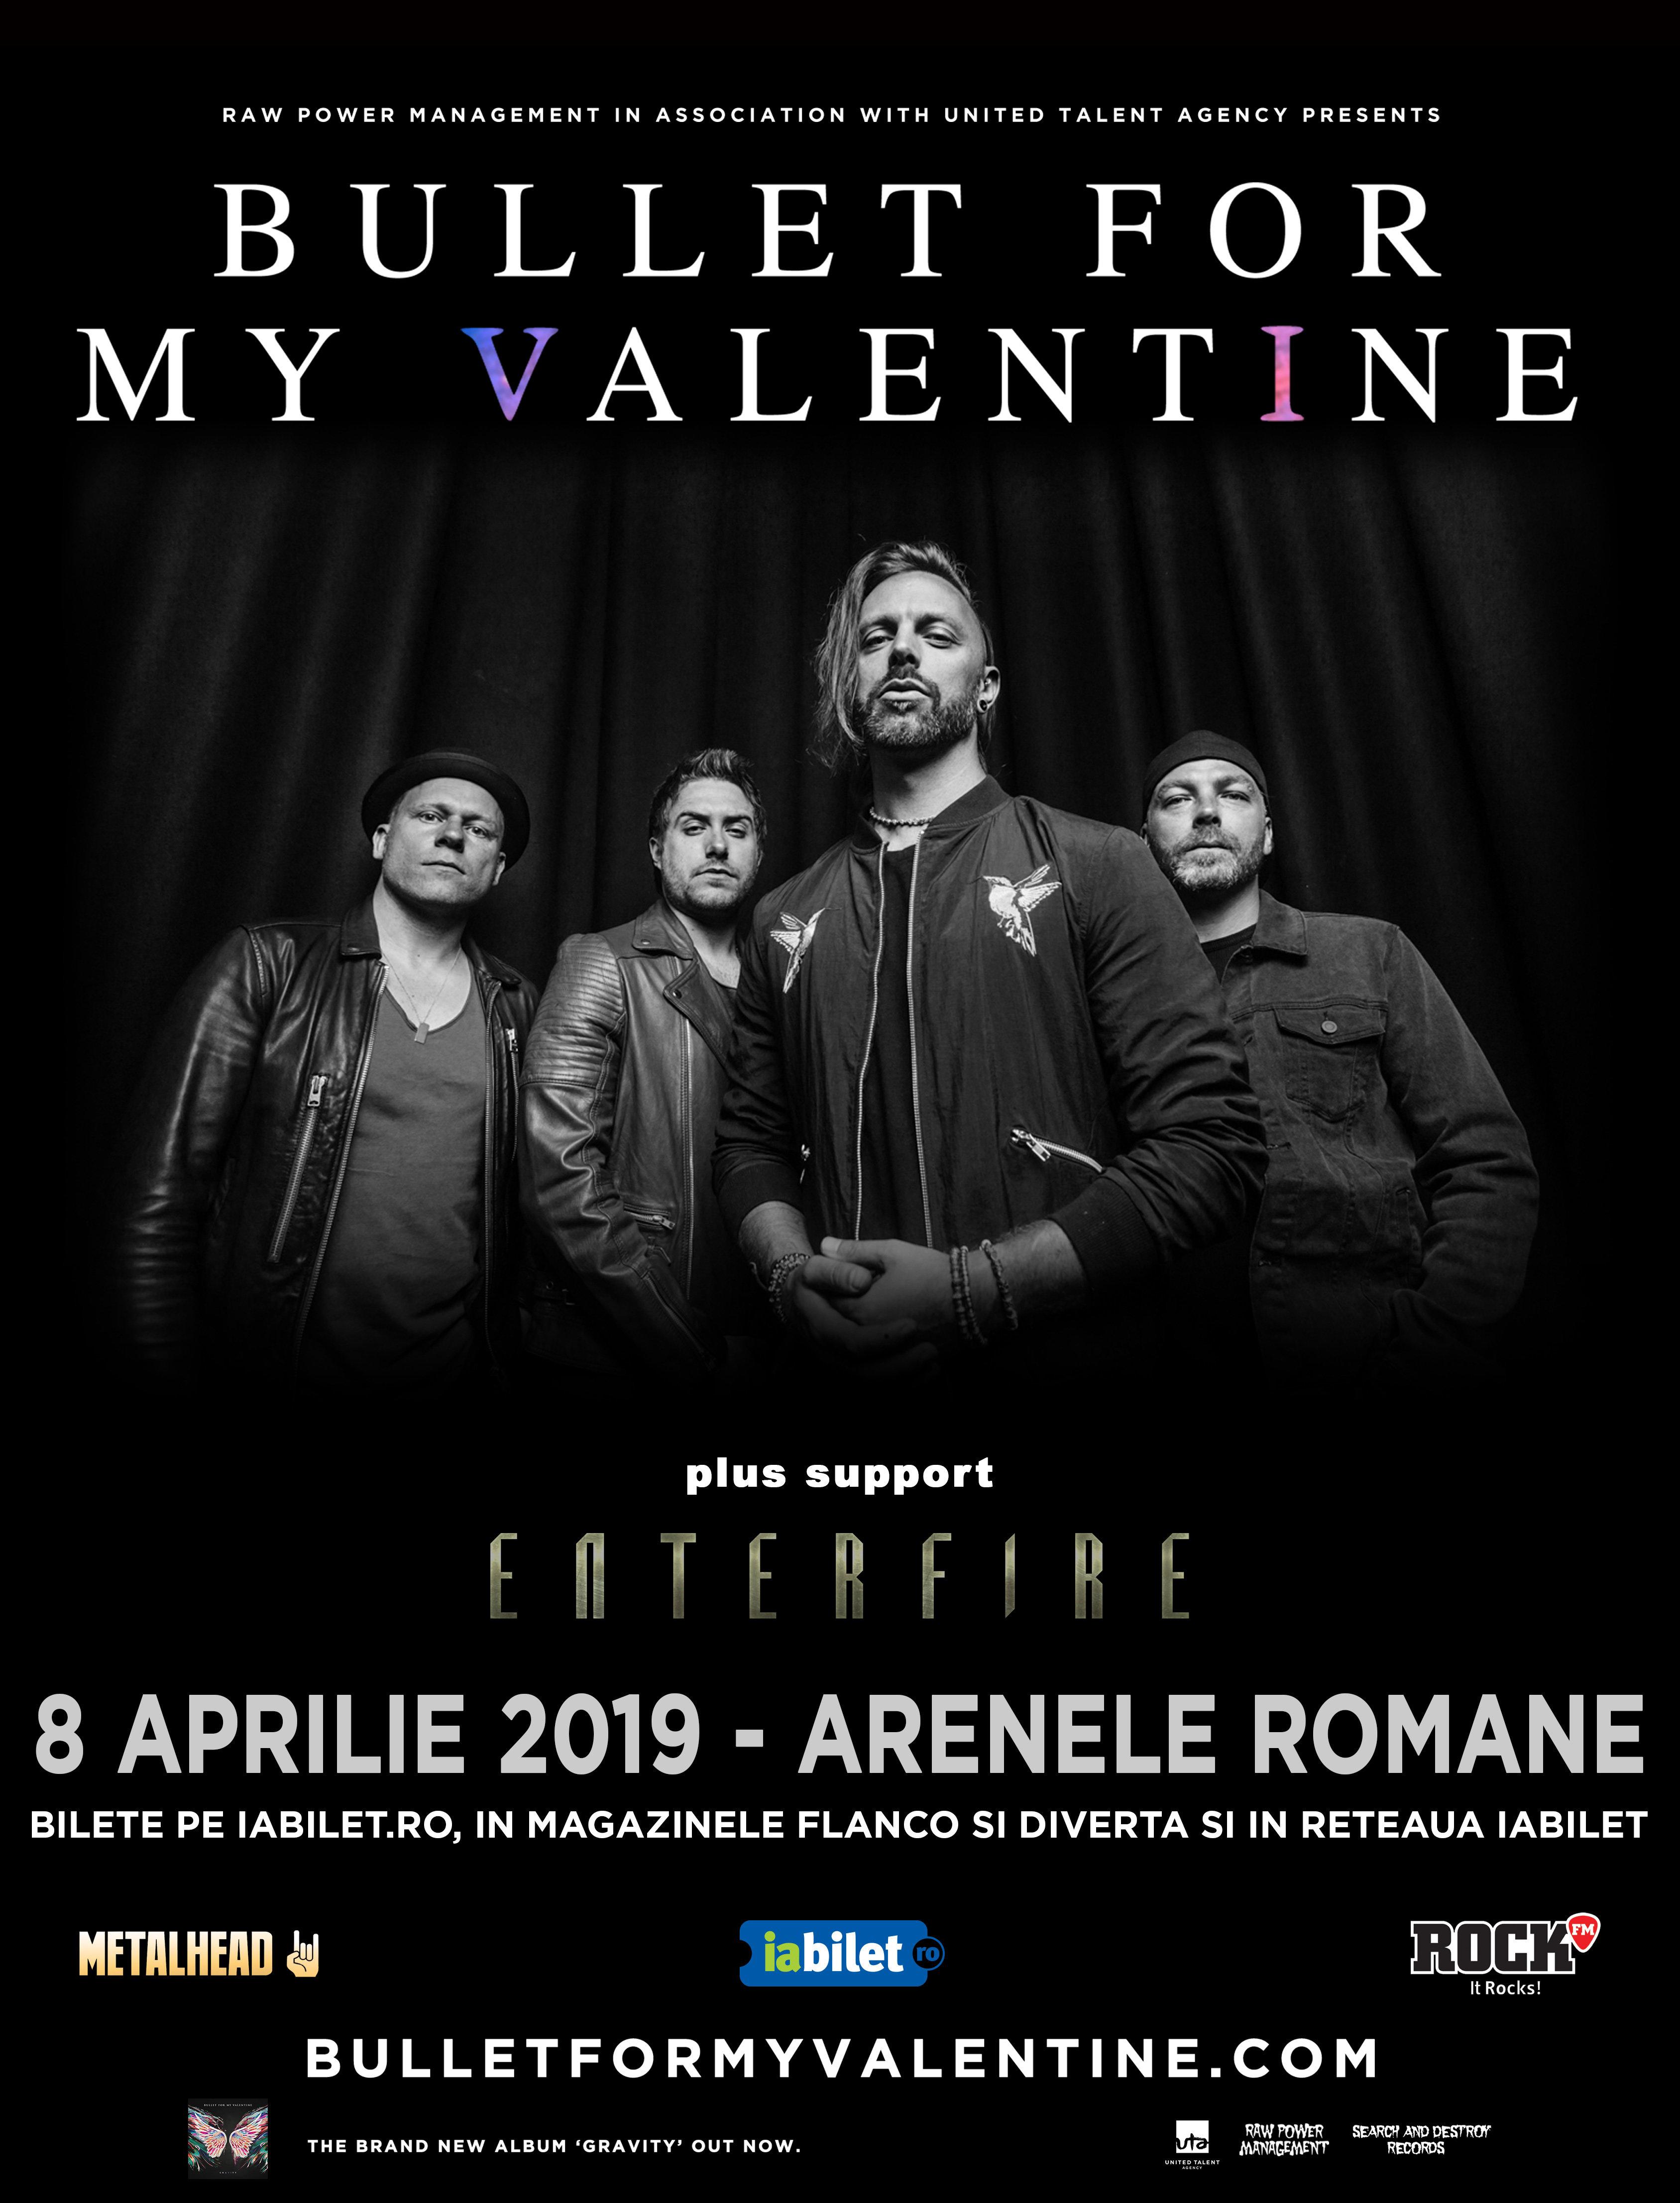 {focus_keyword} Enterfire vor deschide concertul Bullet for My Valentine de la Bucuresti 64e7bdd4 b0e9 4ee3 ab6f 5607e8f4d919